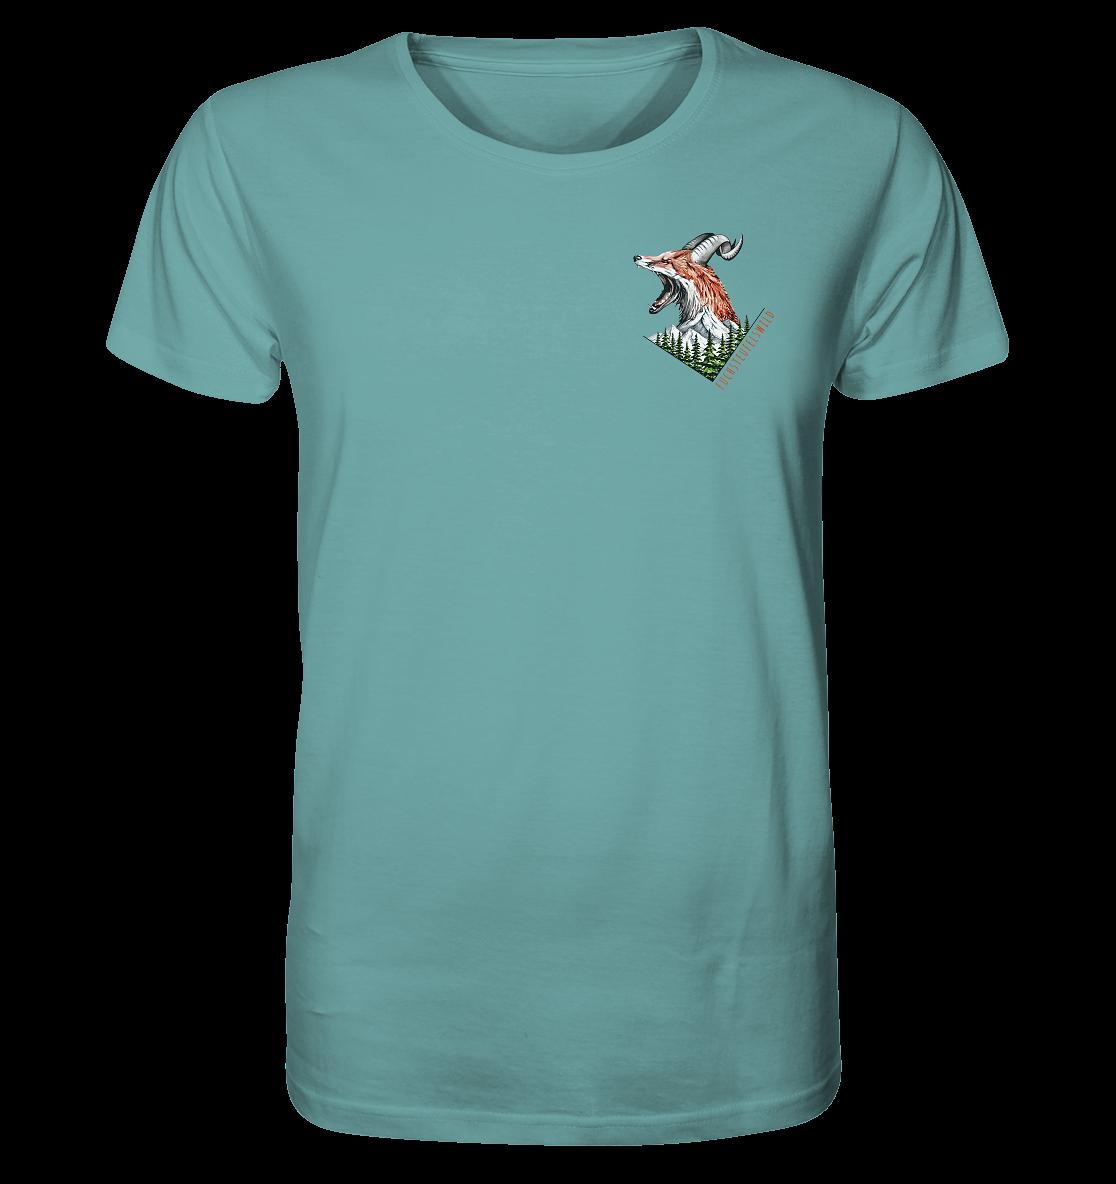 front-organic-shirt-70a7a7-1116x-2.png